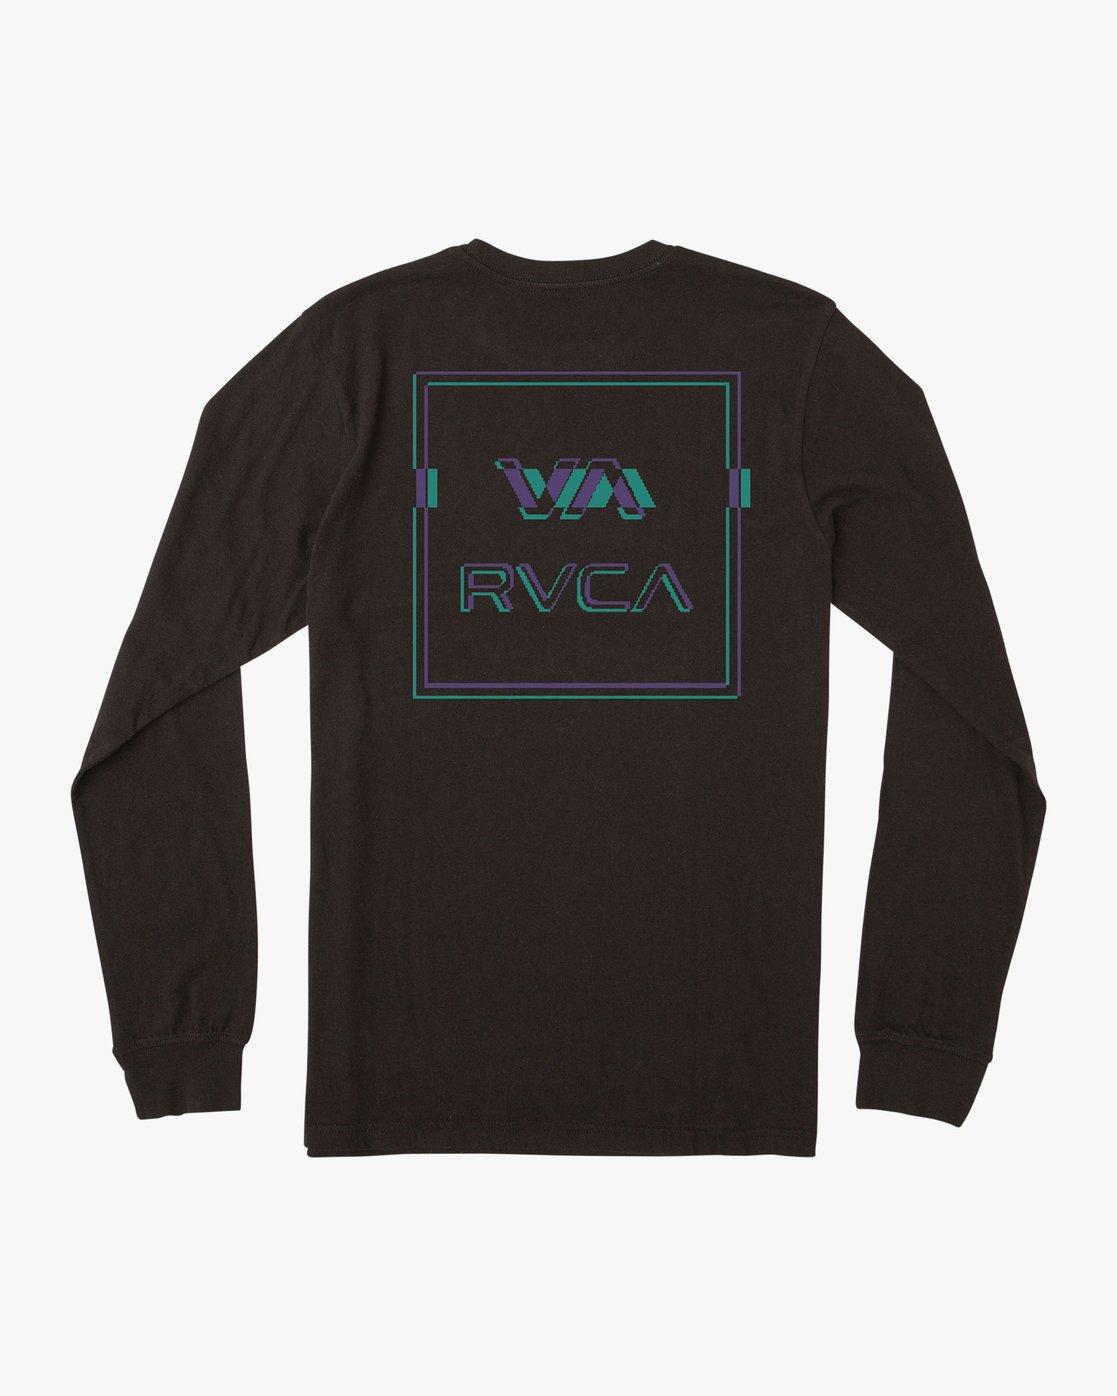 0 Big Glitch Long Sleeve T-Shirt Black M451VRBG RVCA